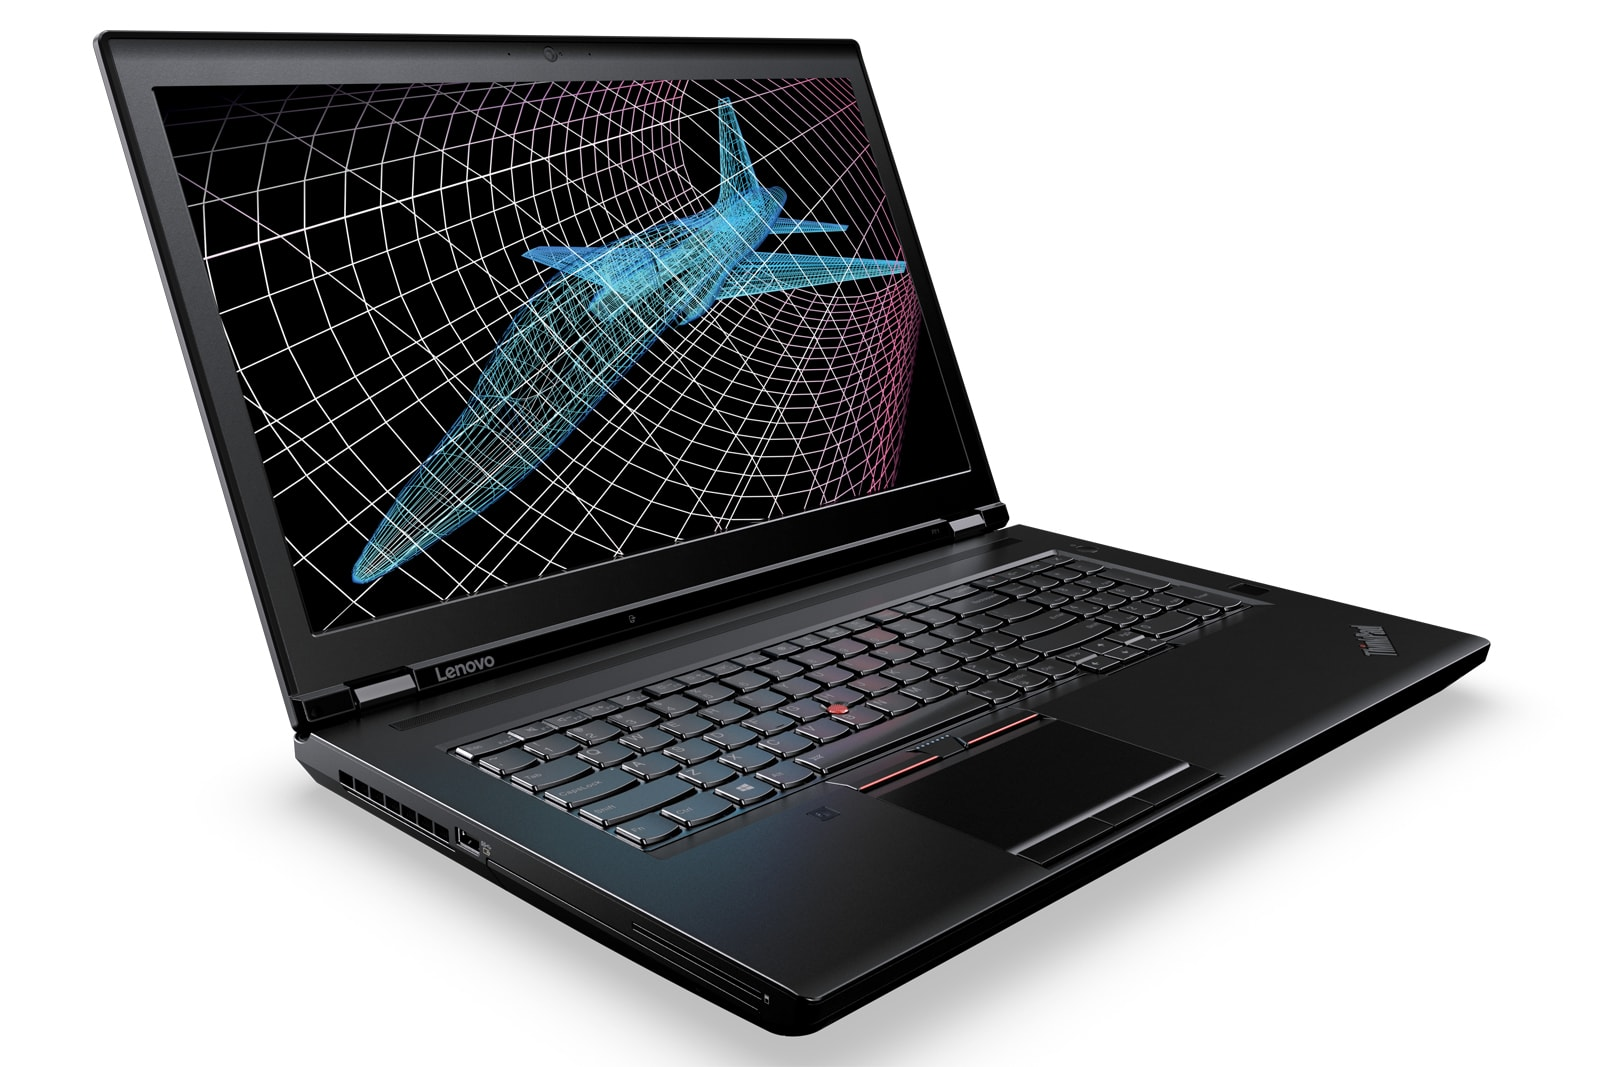 Lenovo's new pro laptops include one built for VR